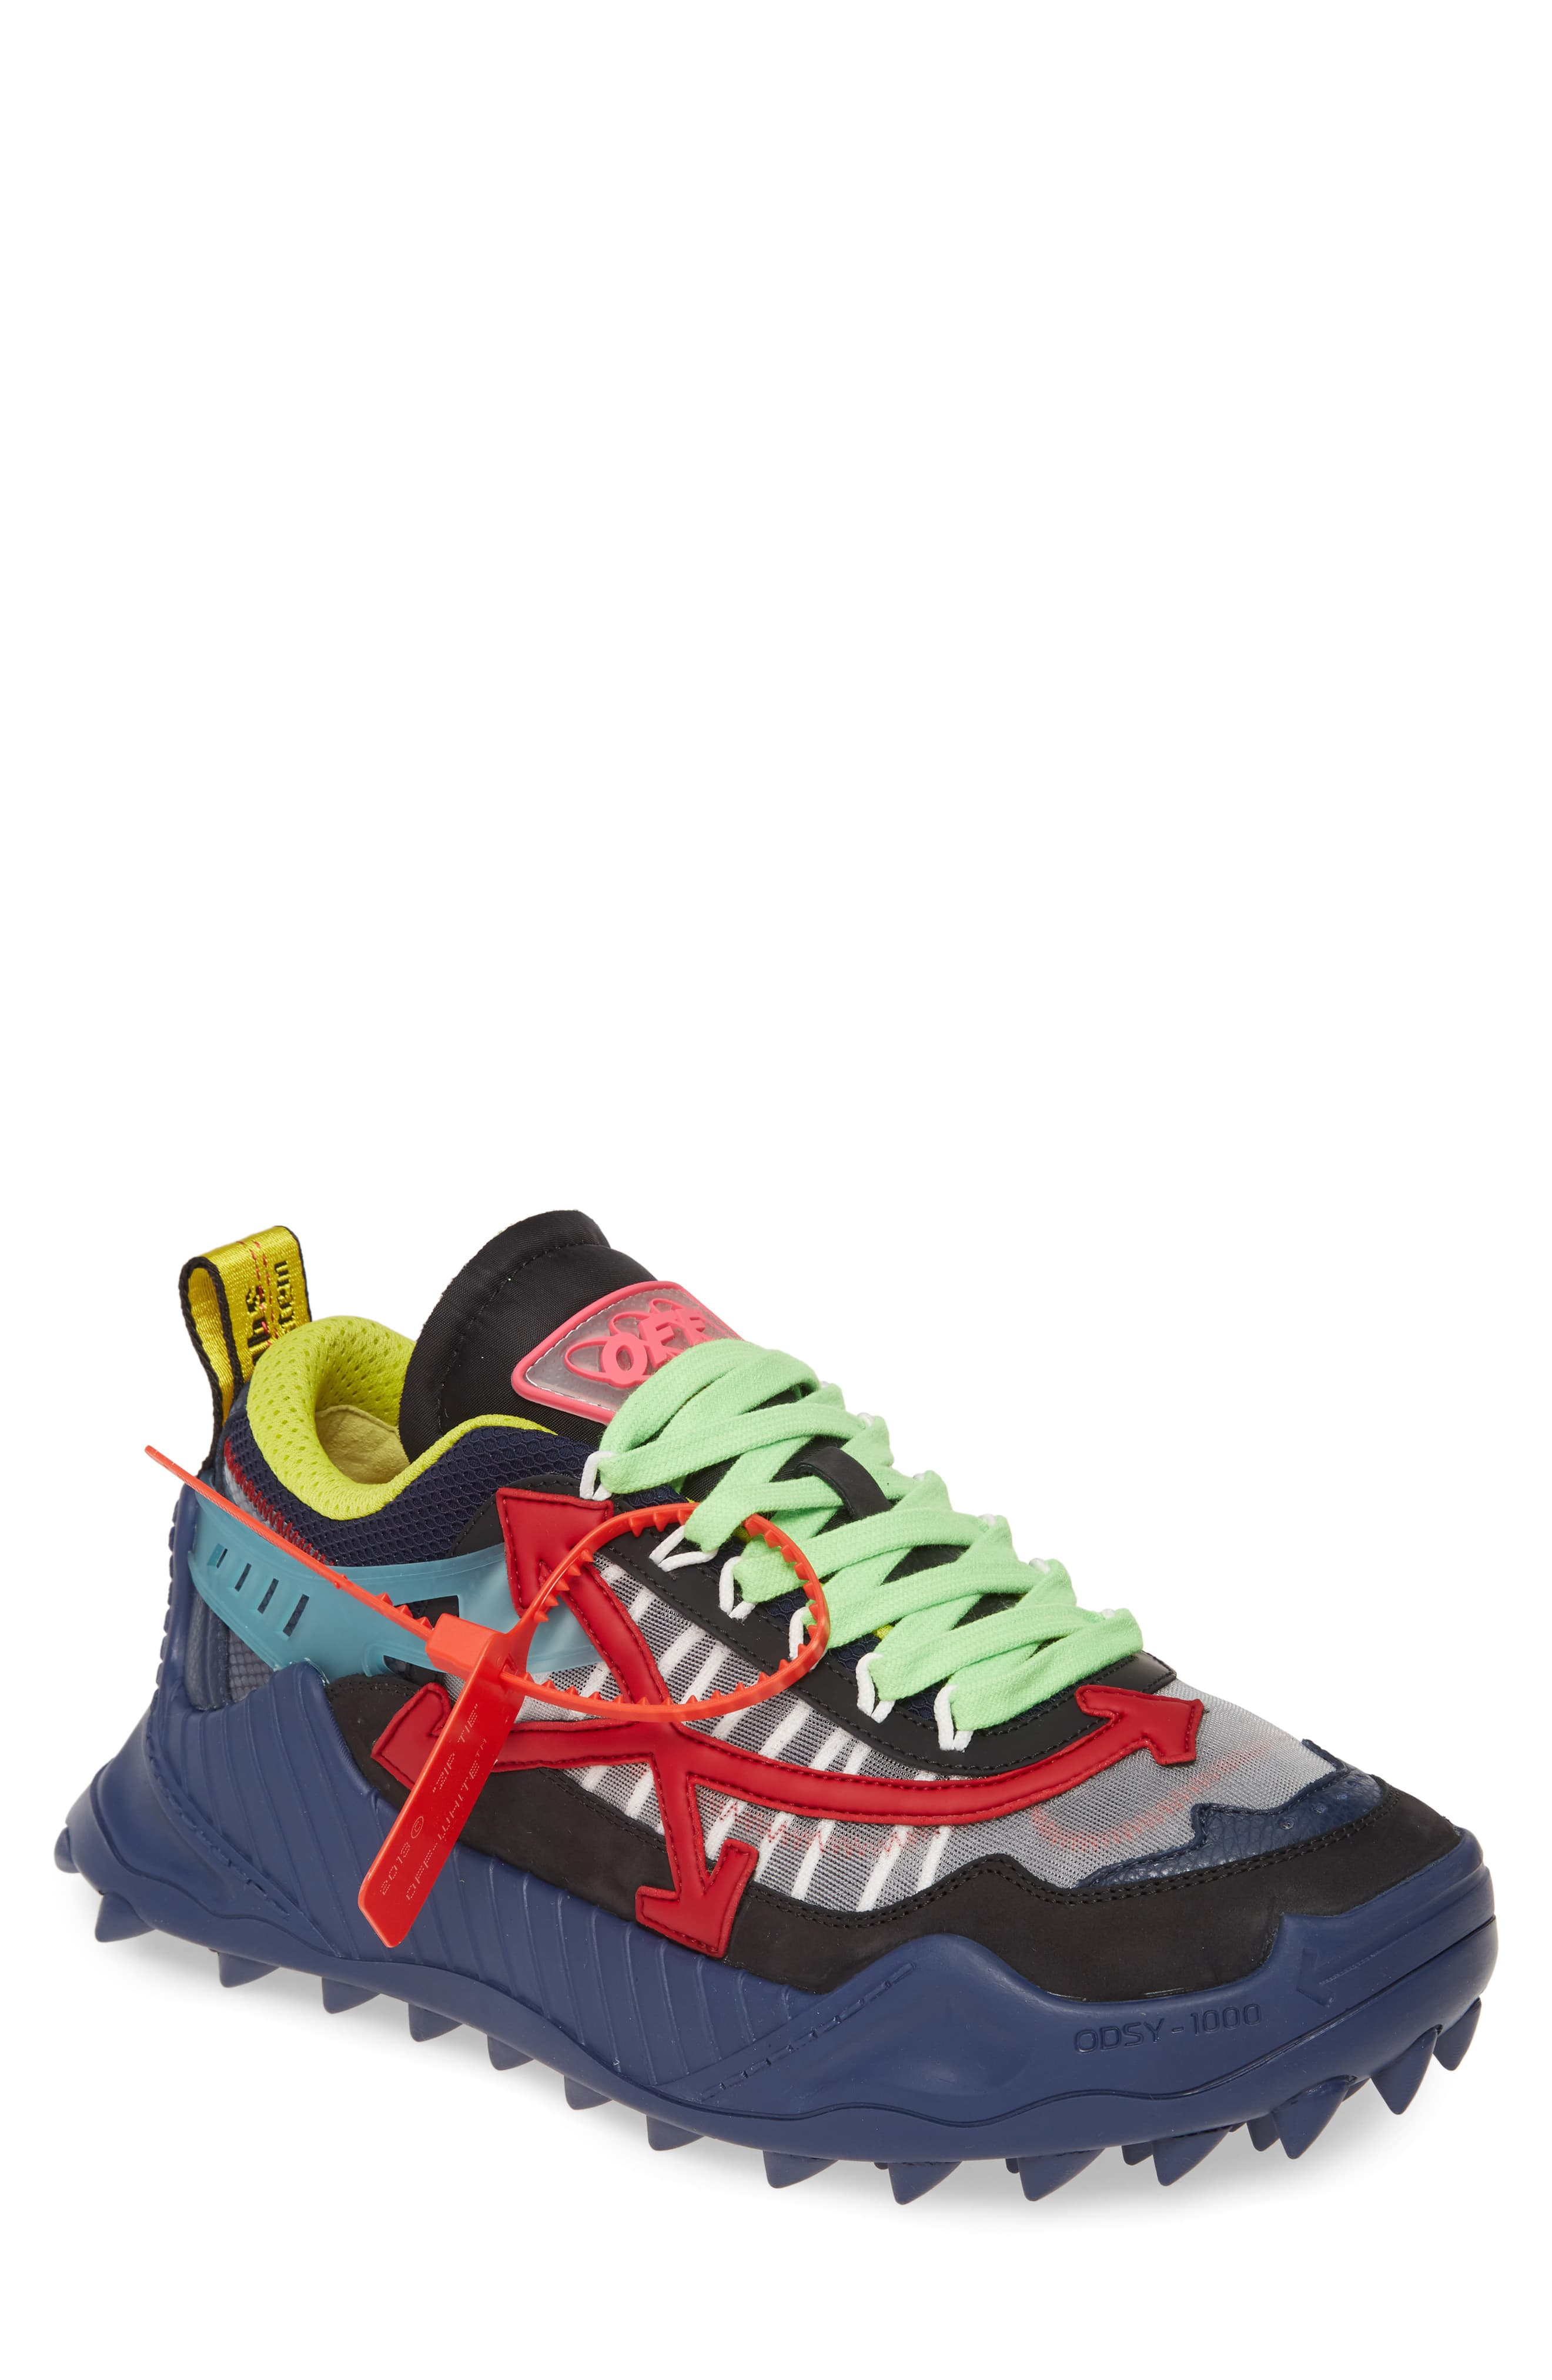 innovative design 31e74 a9bb5 Men's Off-White Odsy-1000 Sneaker, Size 39 EU - Blue